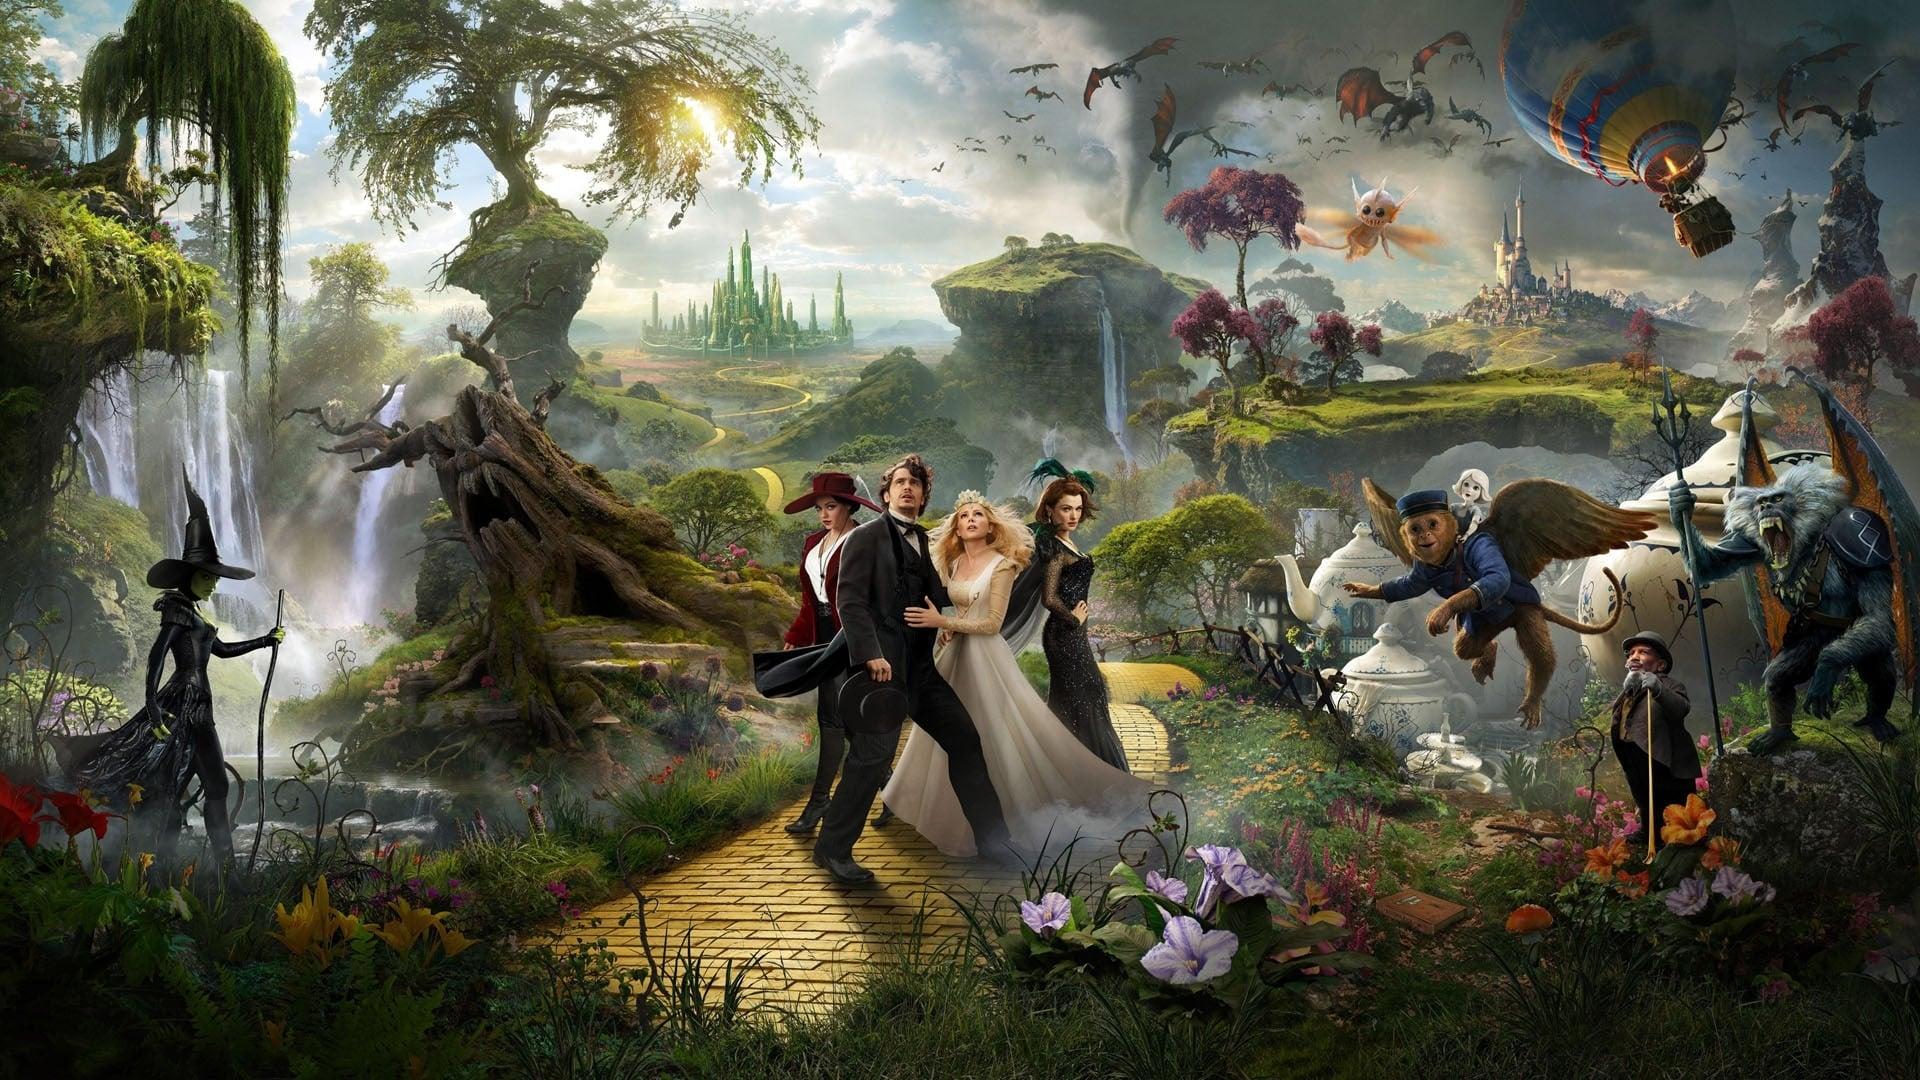 Regarder Le Monde fantastique d'Oz en streaming gratuit